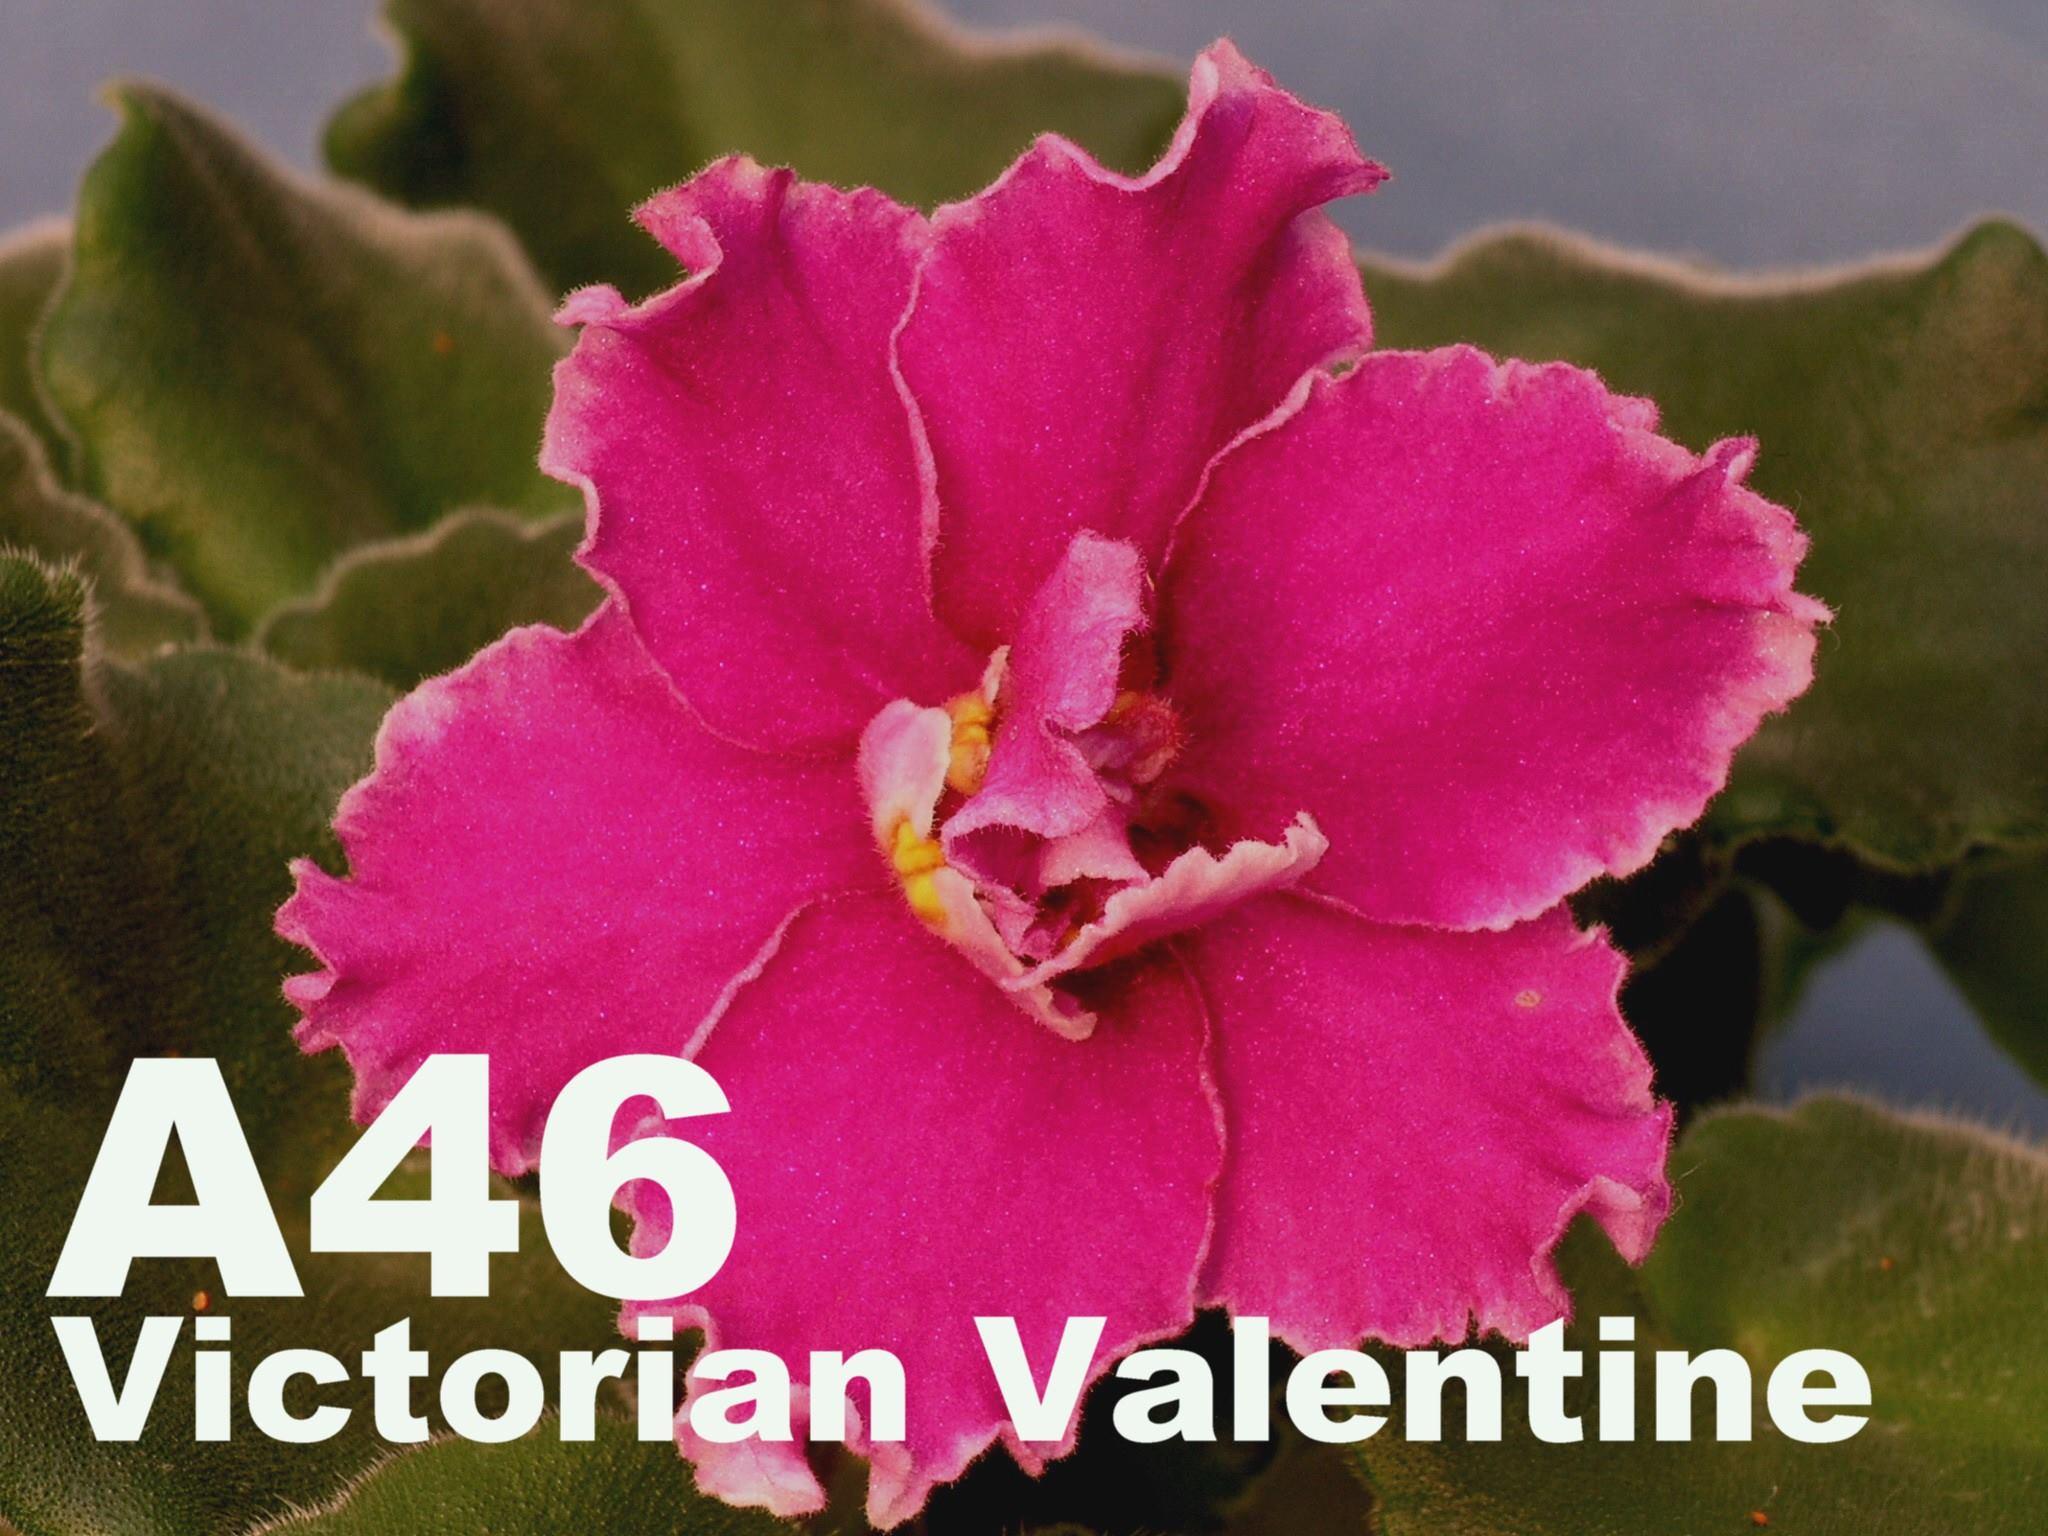 [A46] Lyon's Victorian Valentine A46